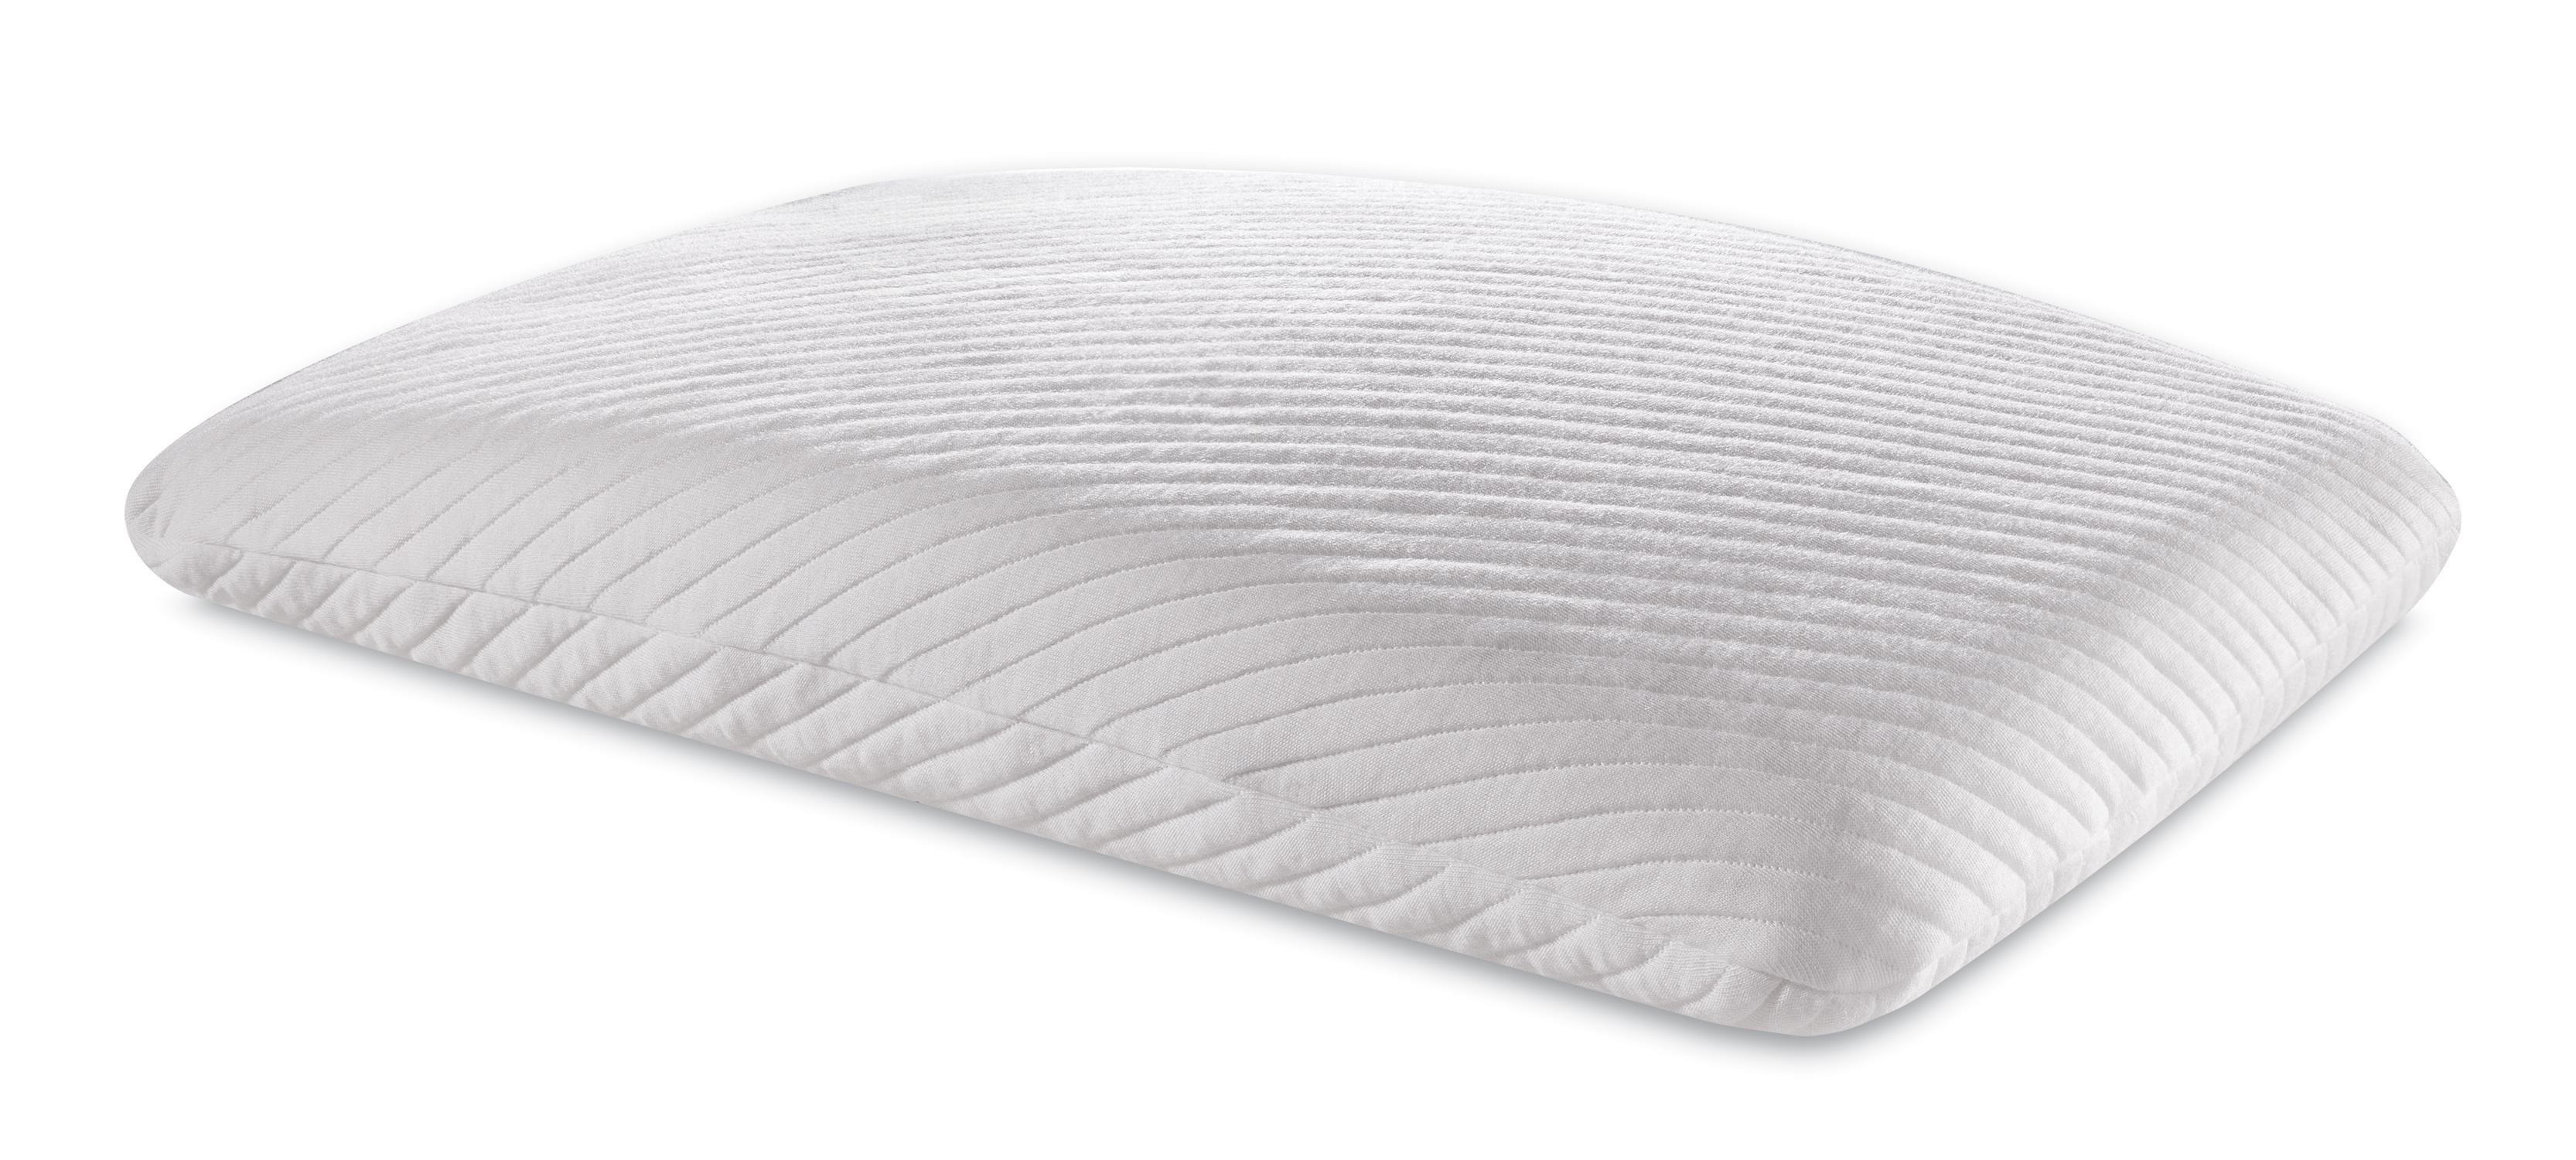 Tempur Pillows TEMPUR®-Essential Support Pillow by Tempur-Pedic® at Jacksonville Furniture Mart